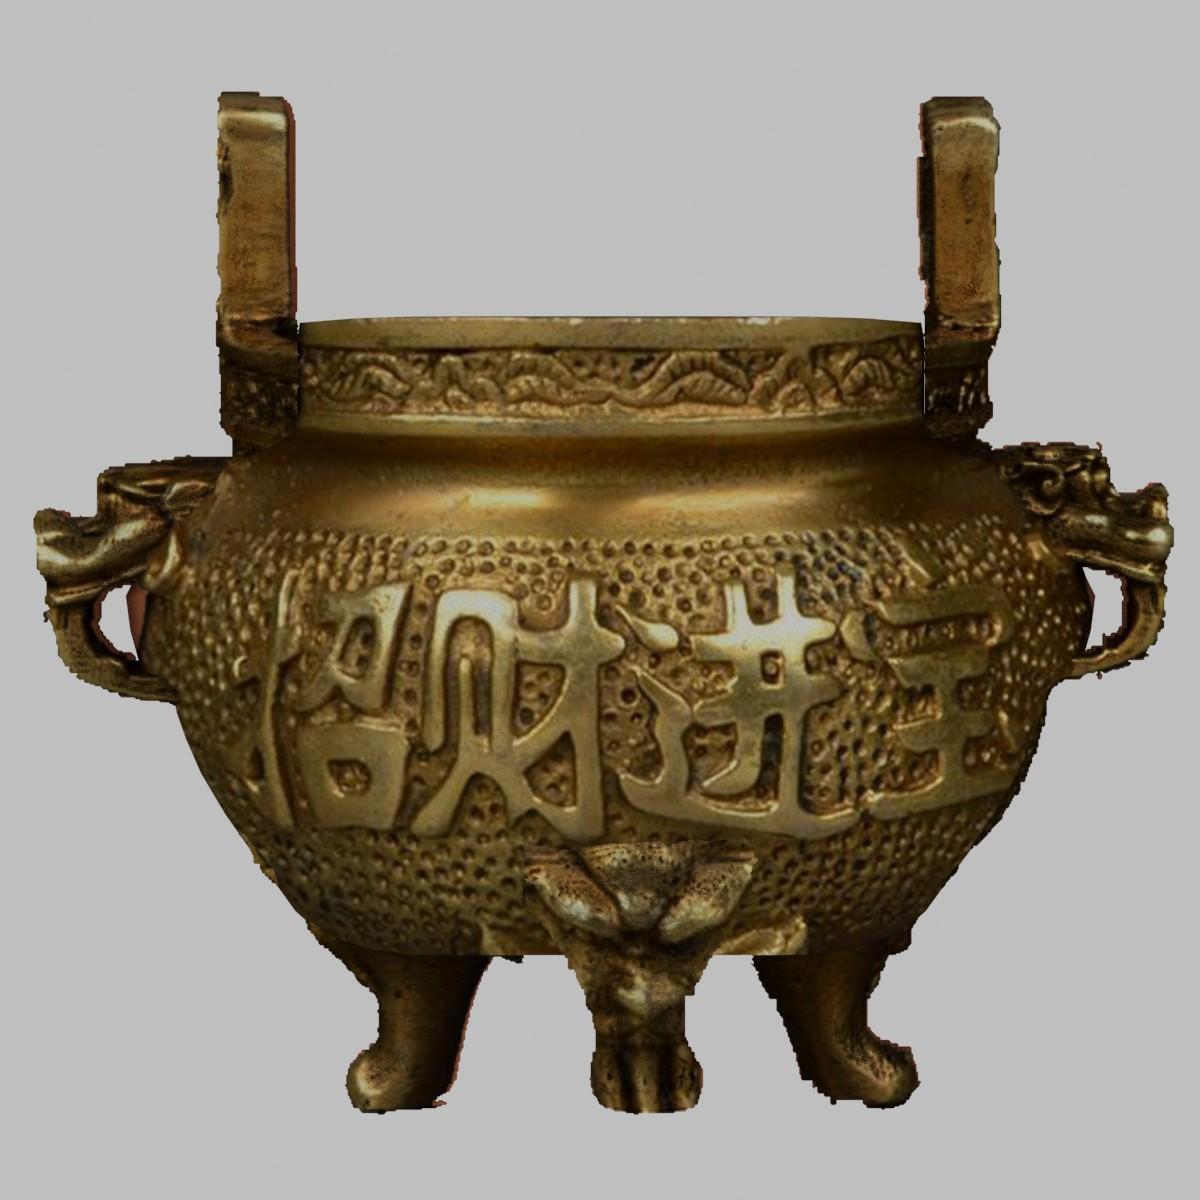 burner_BuddhaA1.jpg